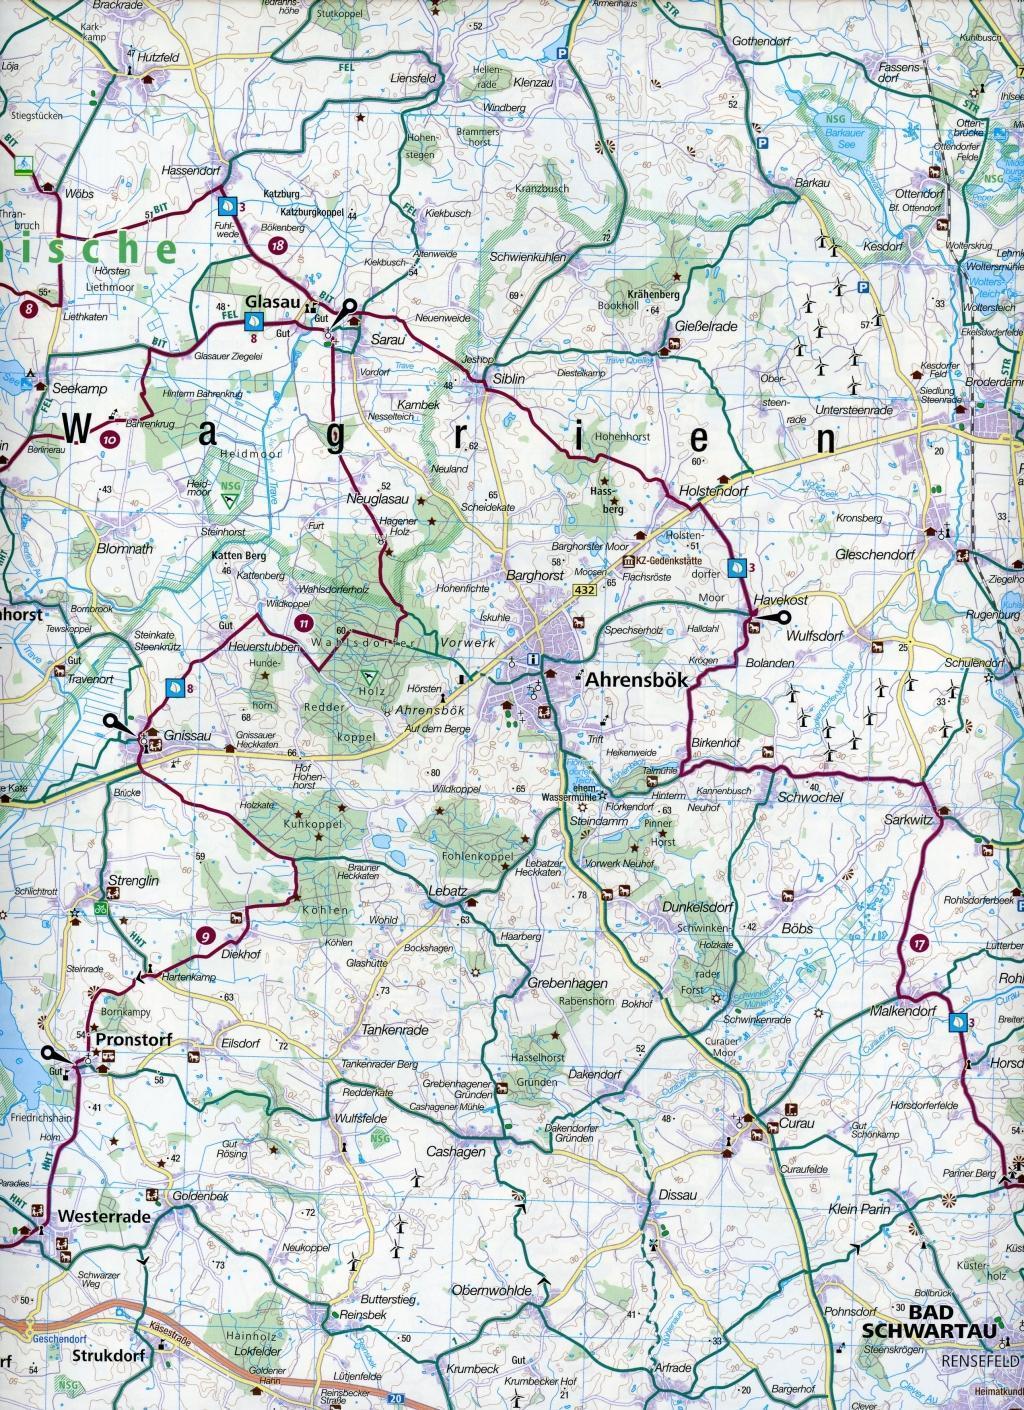 KOMPASS Fahrradkarte Fehmarn, Holsteinische Schweiz, Lübeck 1:70